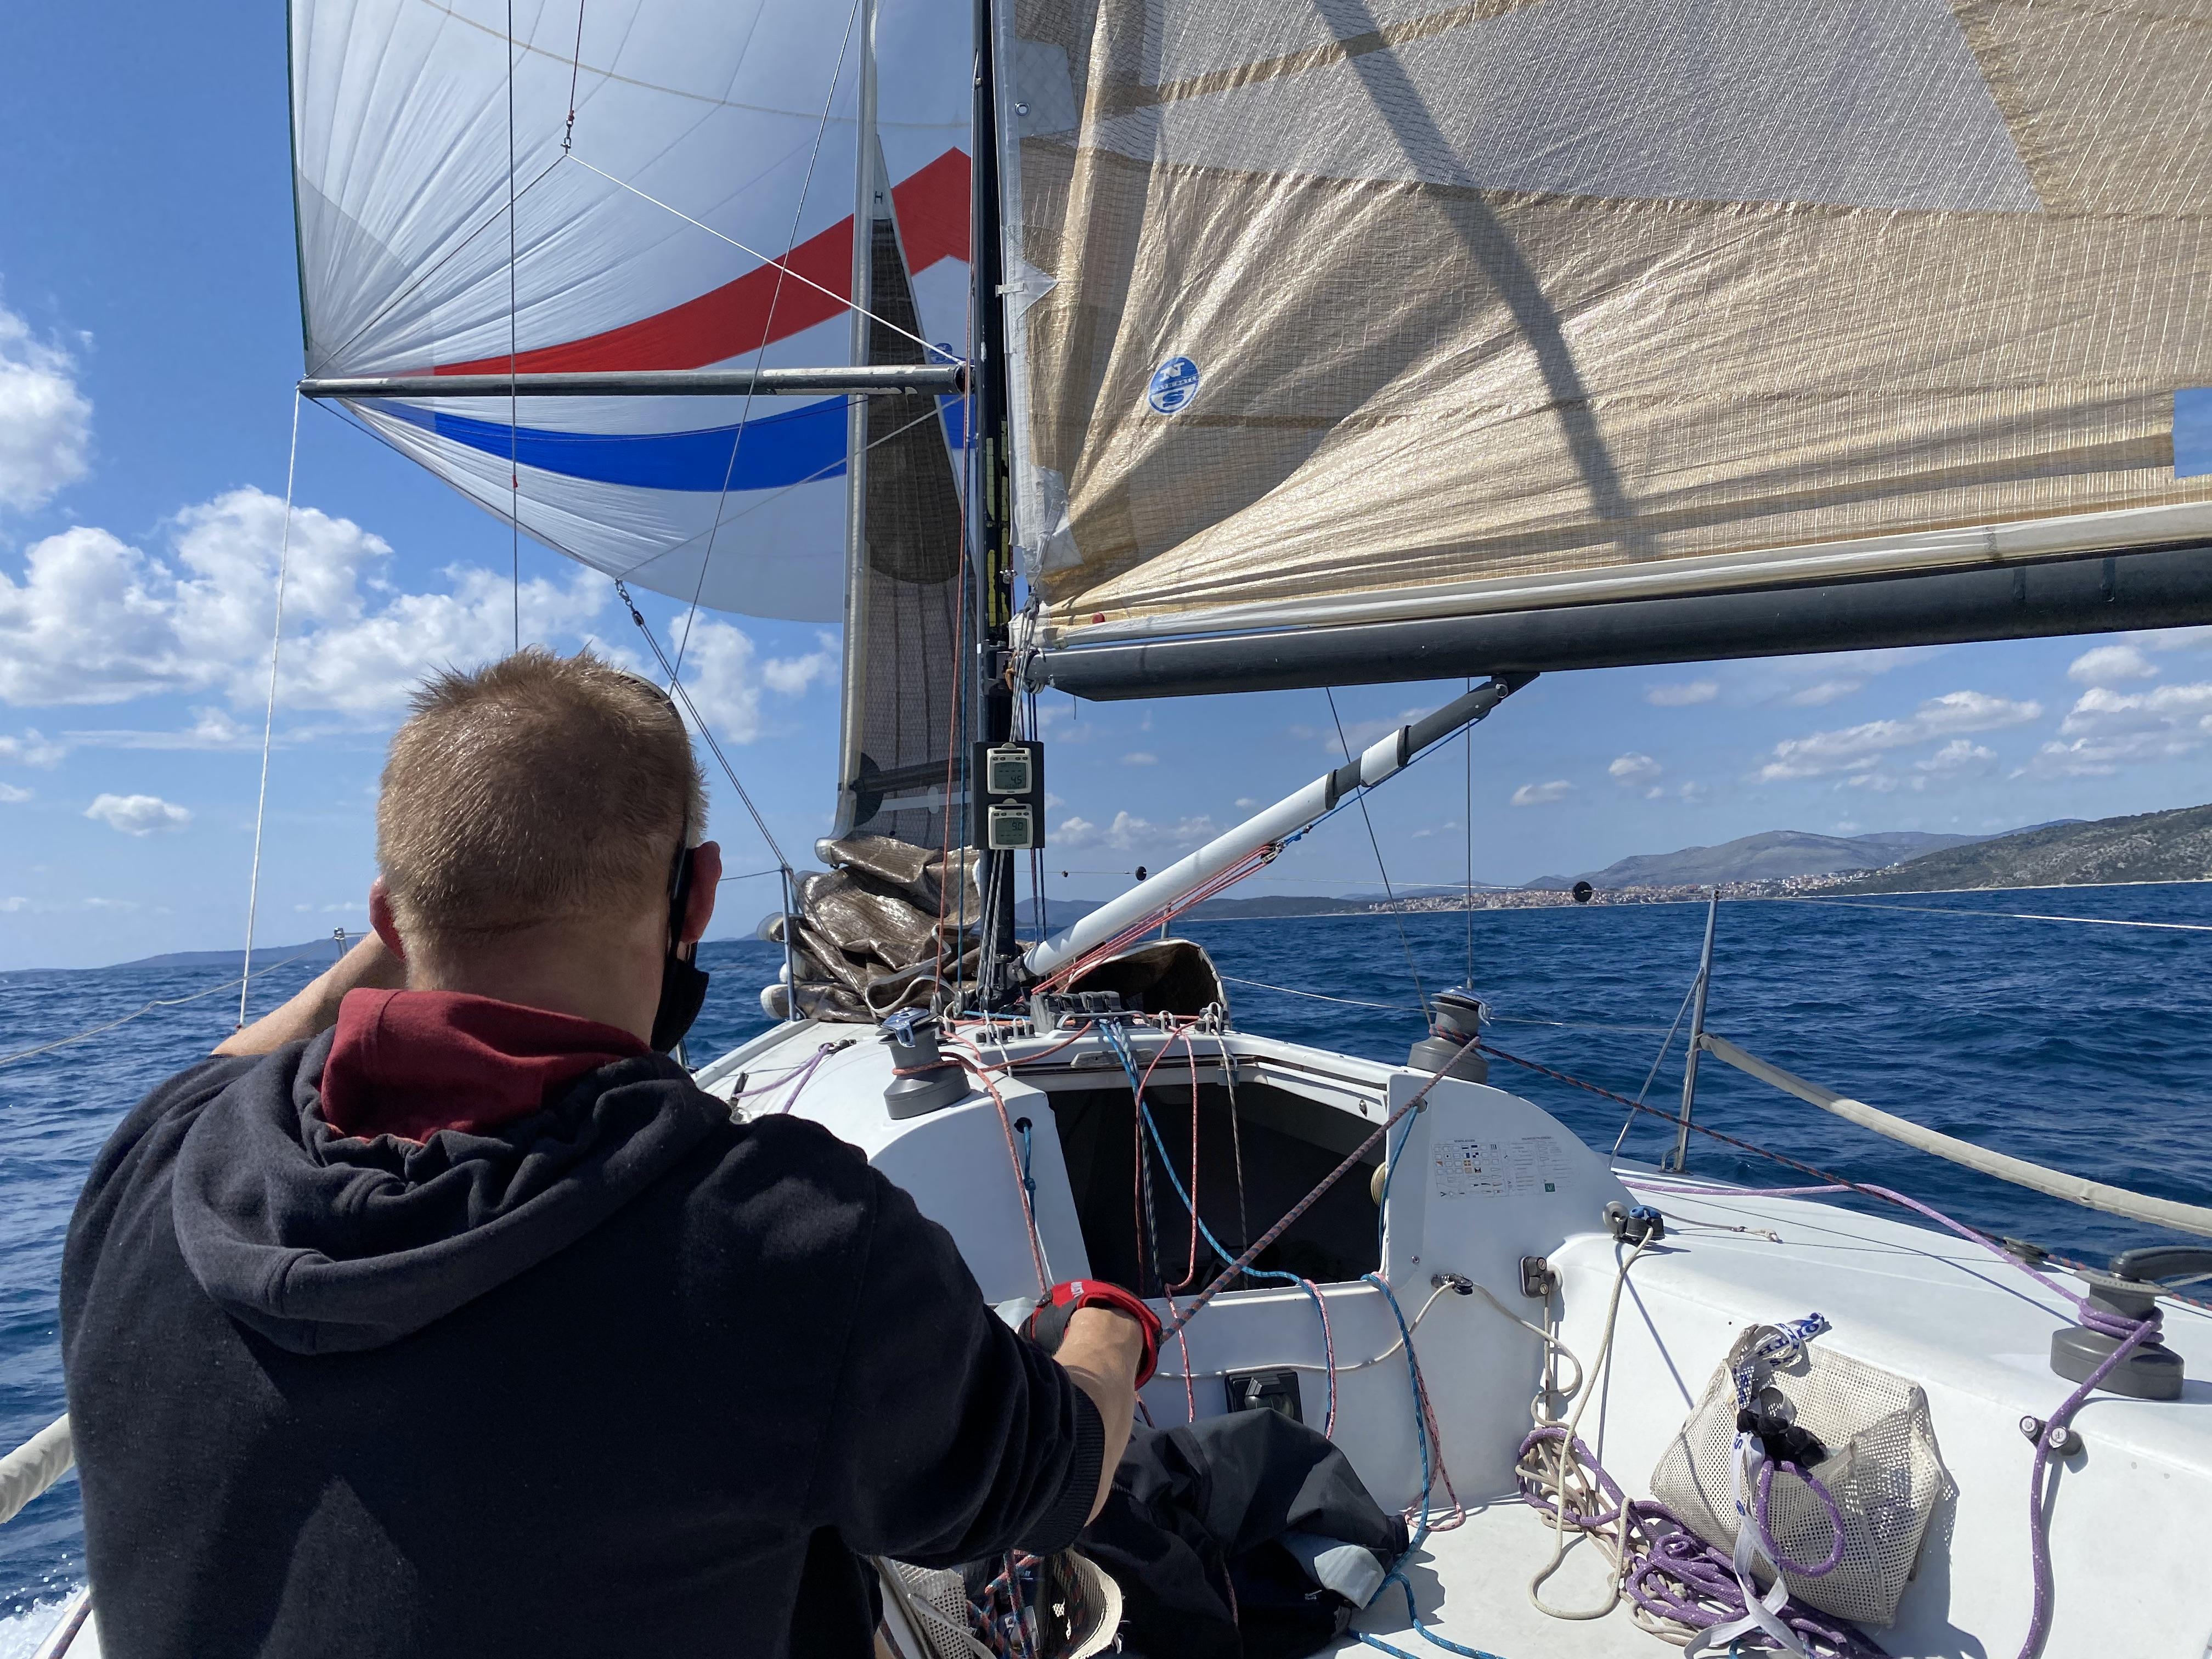 Regatta Sailing Course